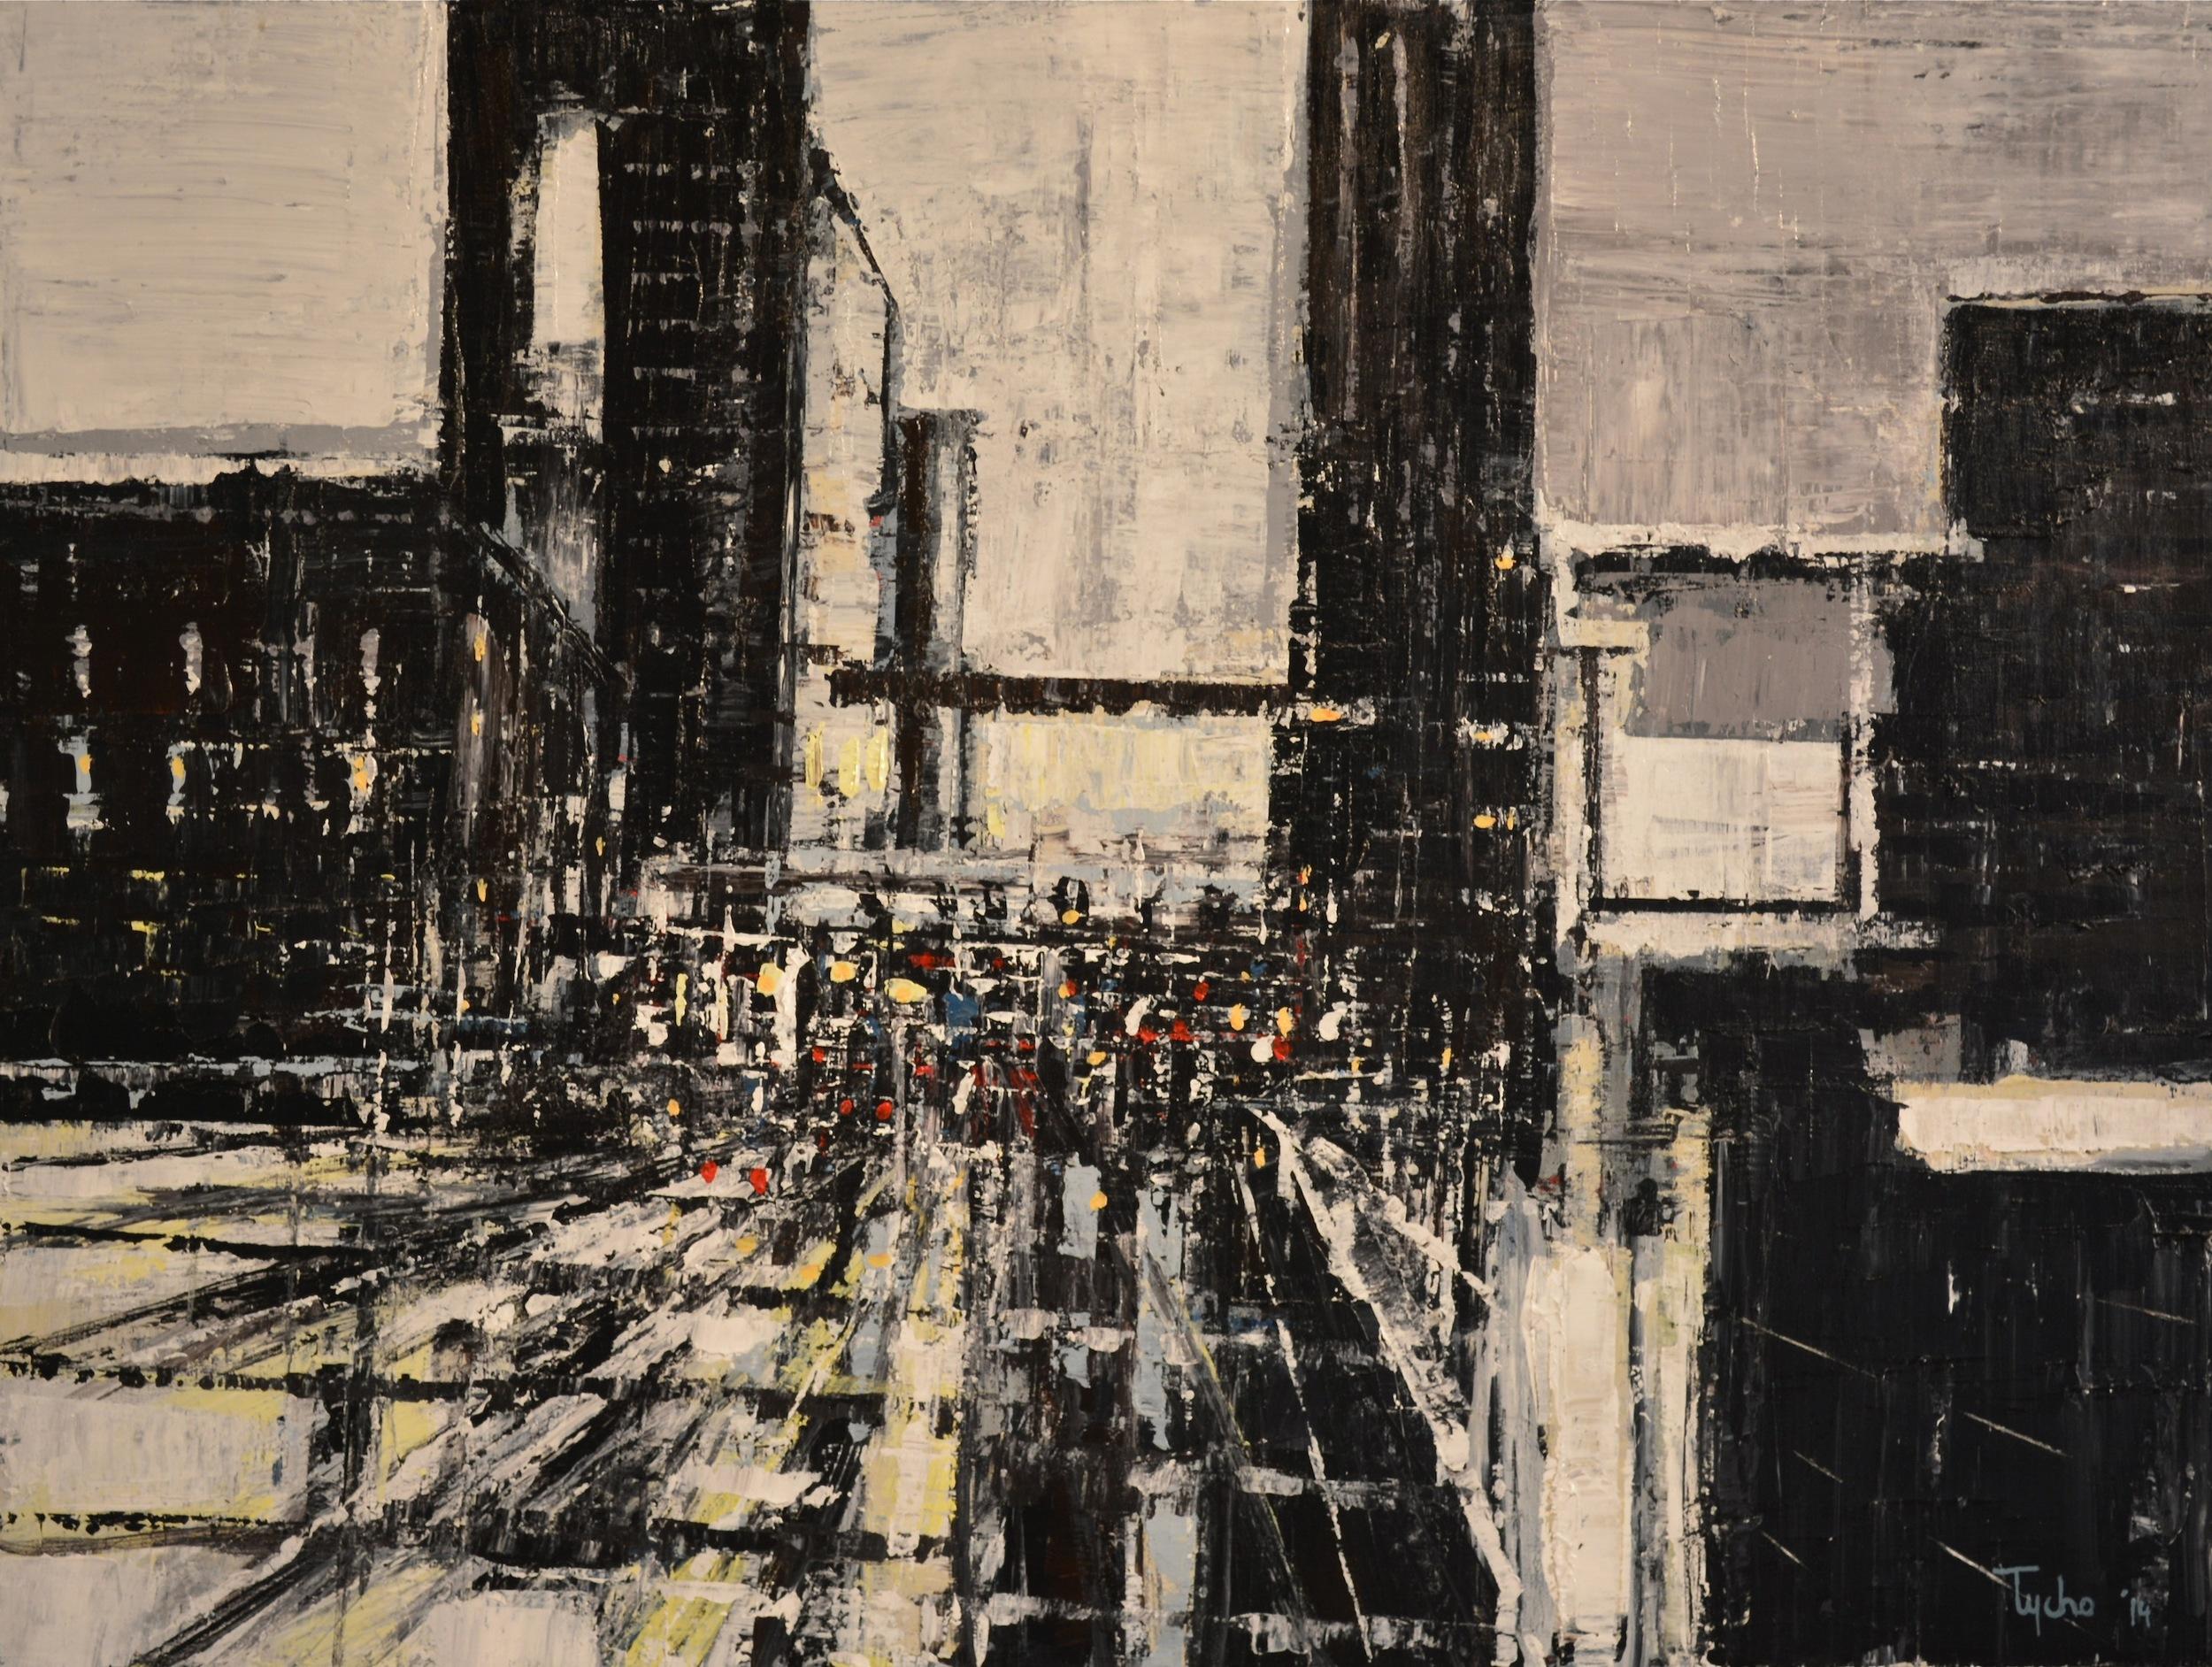 DTY-008,Urban Rhapsody #12, 30 x 40,2014,$3800